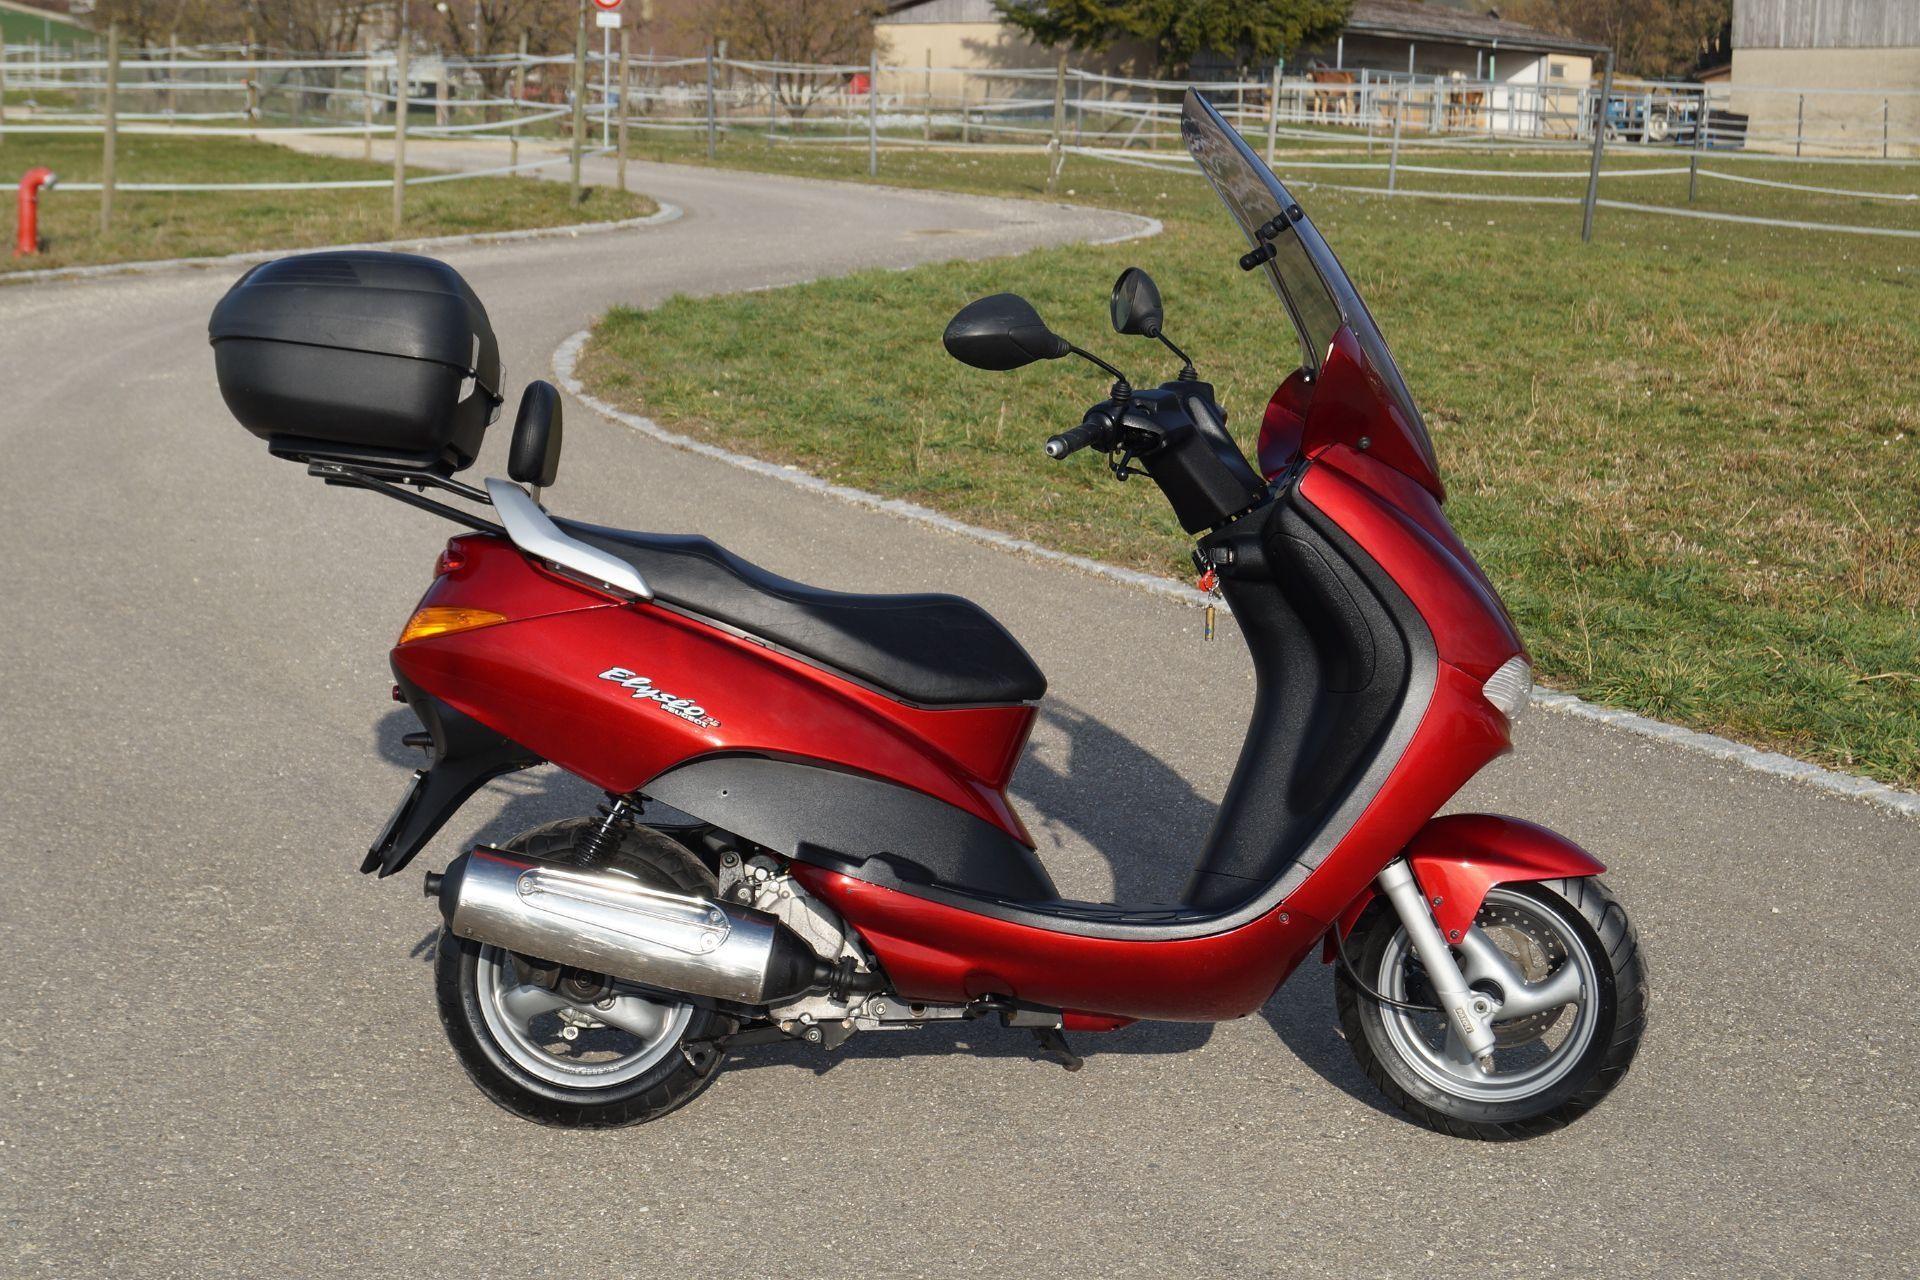 motorrad occasion kaufen peugeot elyseo 125 motoshop. Black Bedroom Furniture Sets. Home Design Ideas